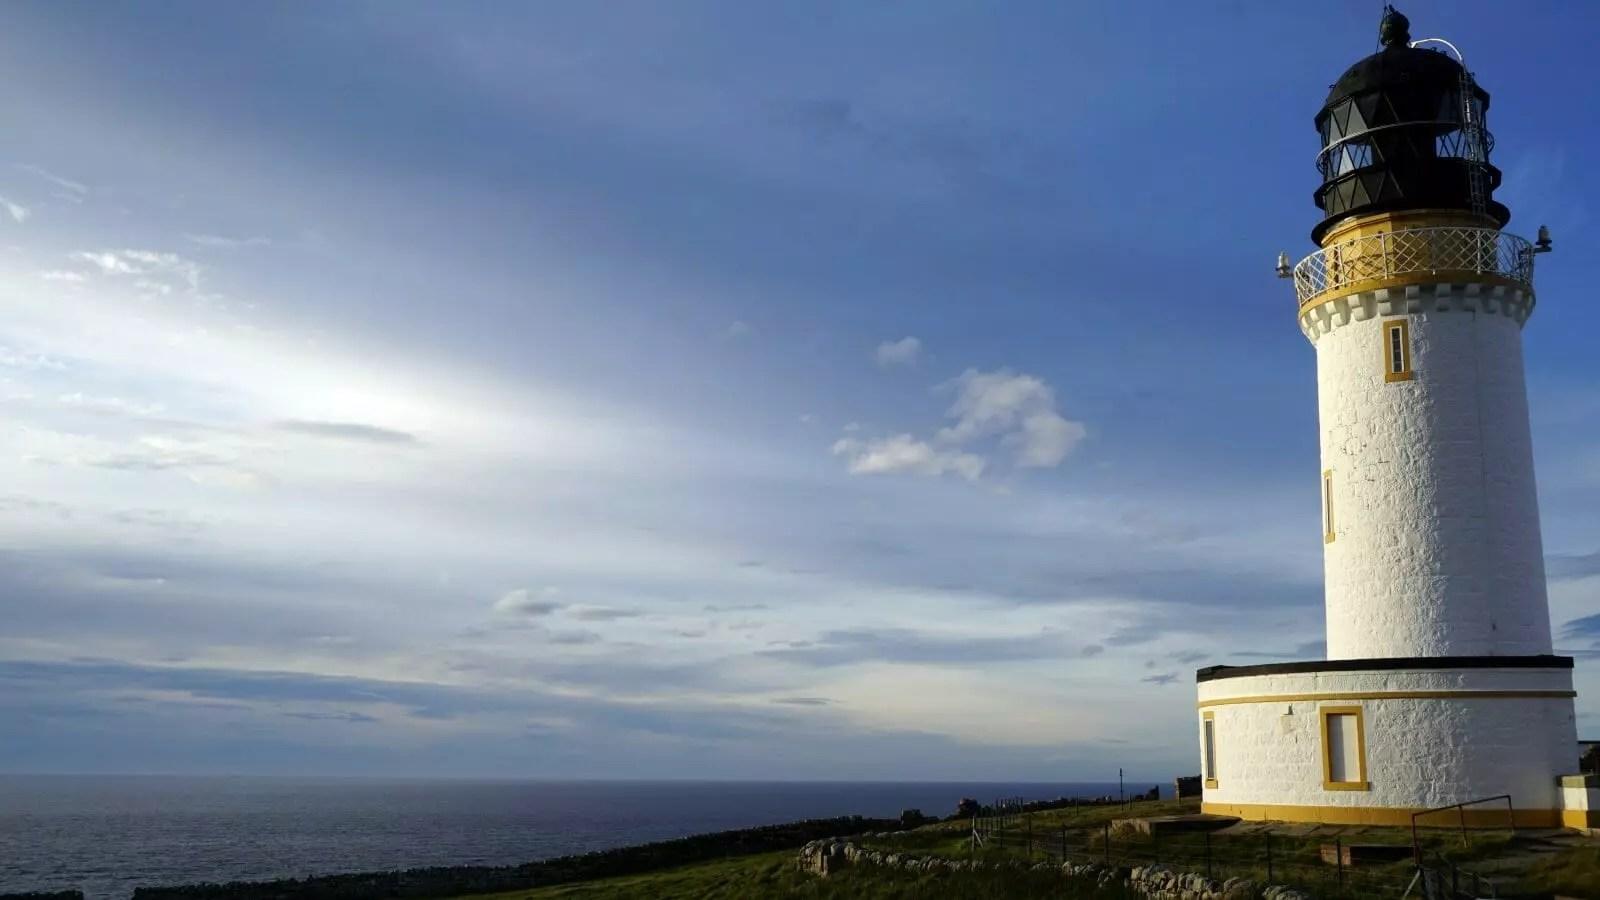 Cape Wrtah Trail Lighthouse